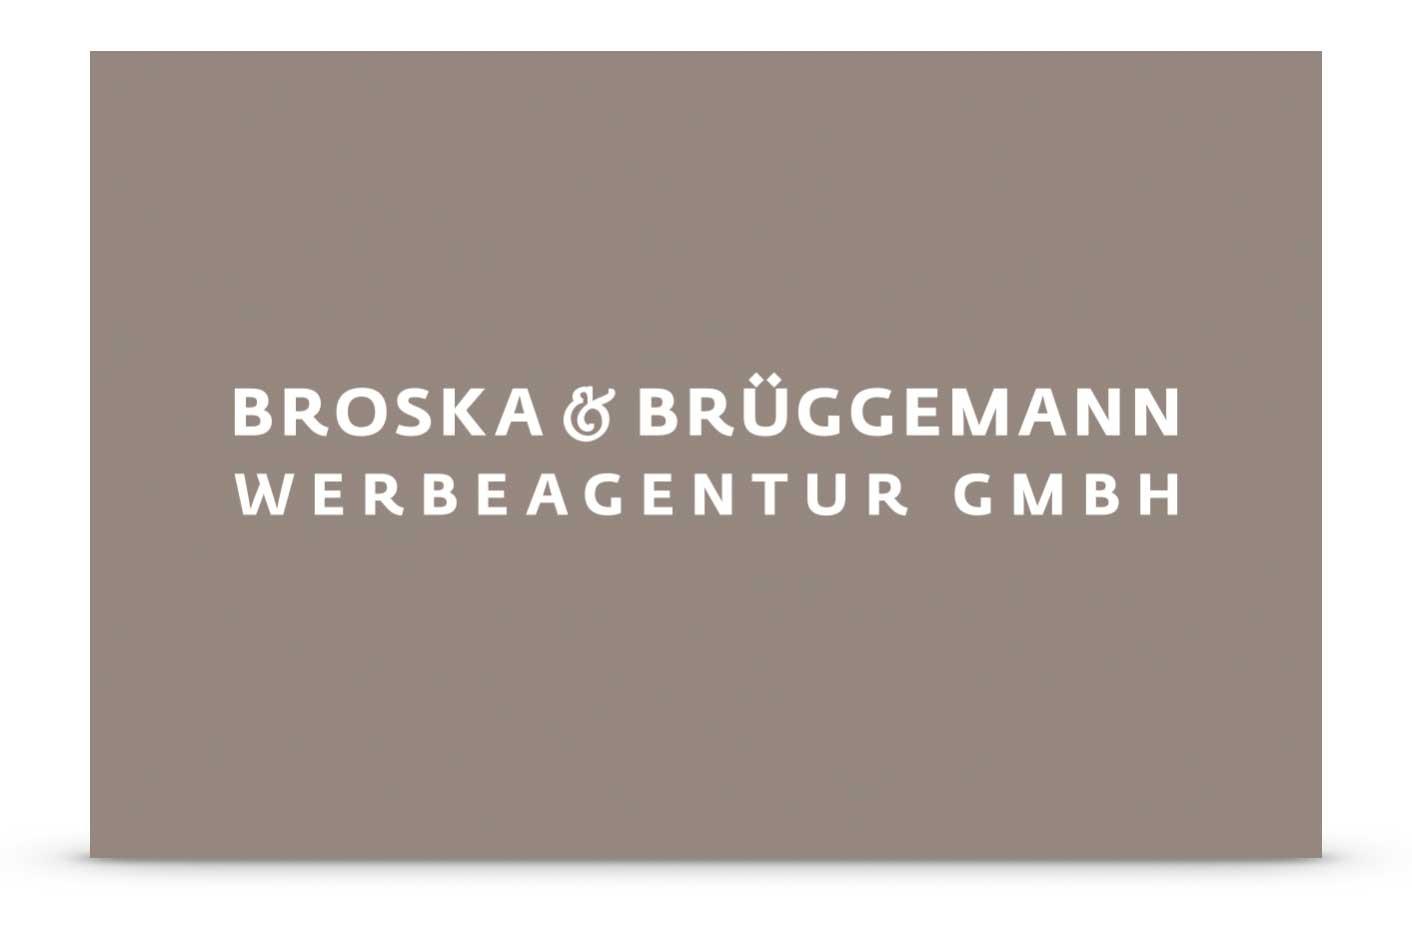 Logo Broska & Brüggemann Werbeagentur GmbH